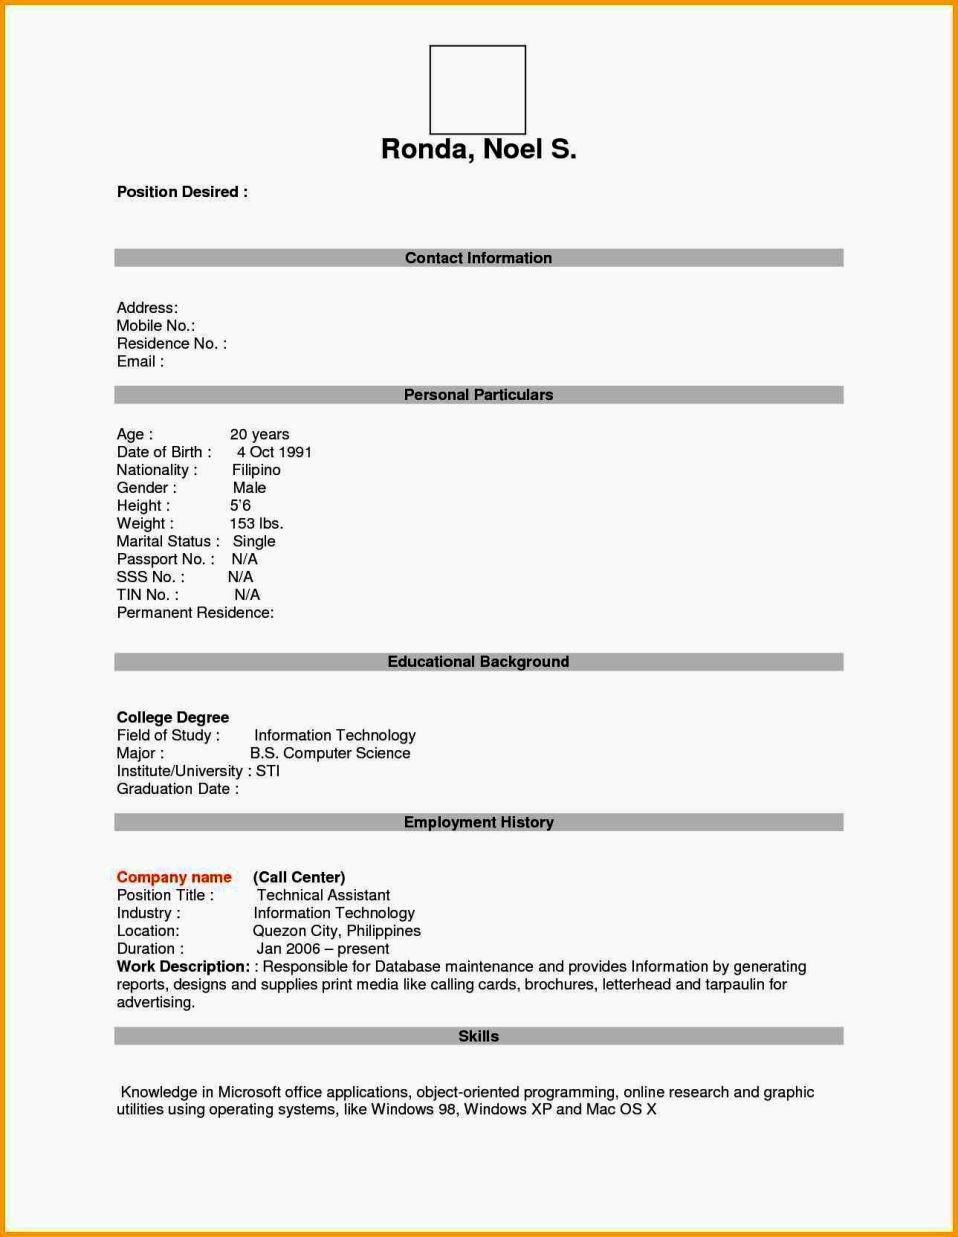 Fill In The Blank Resume Pdf Elegant Empty Resume Format Pdf Resume with Fill In The Blank Template